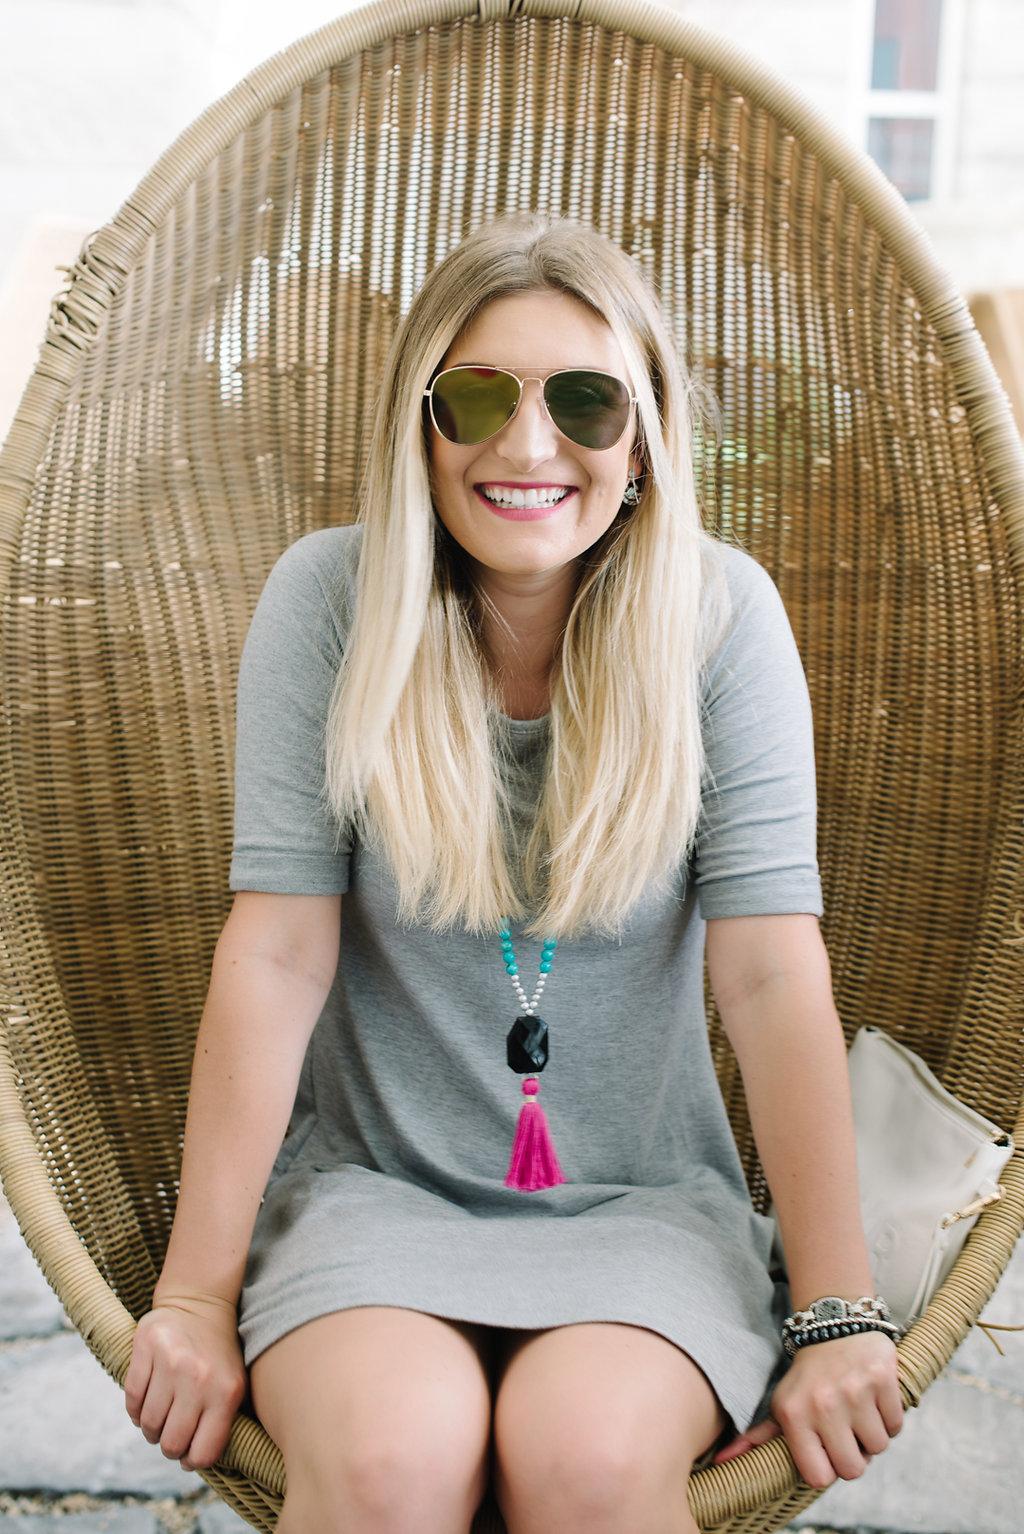 bailey blue dress and makeup | Audrey Madison Stowe Blog